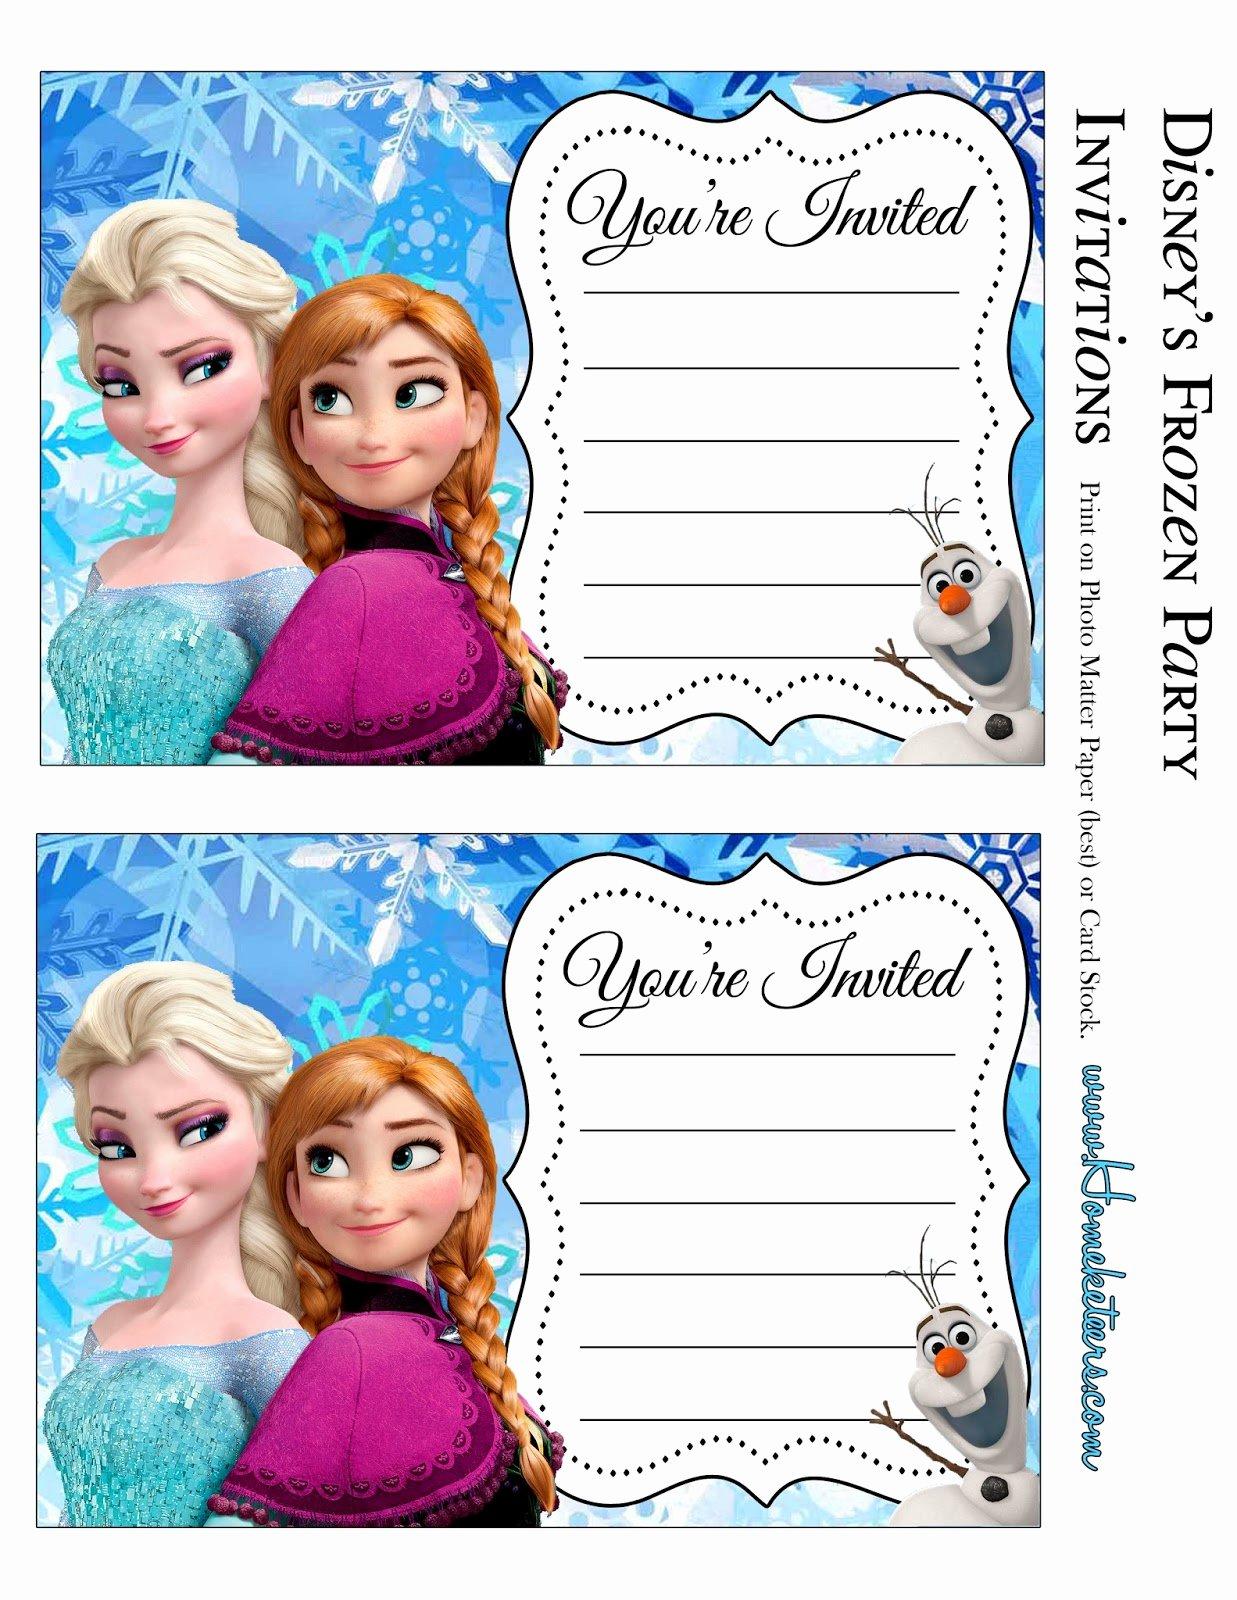 Free Frozen Invite Template Fresh Frozen Party Free Printable Invitations